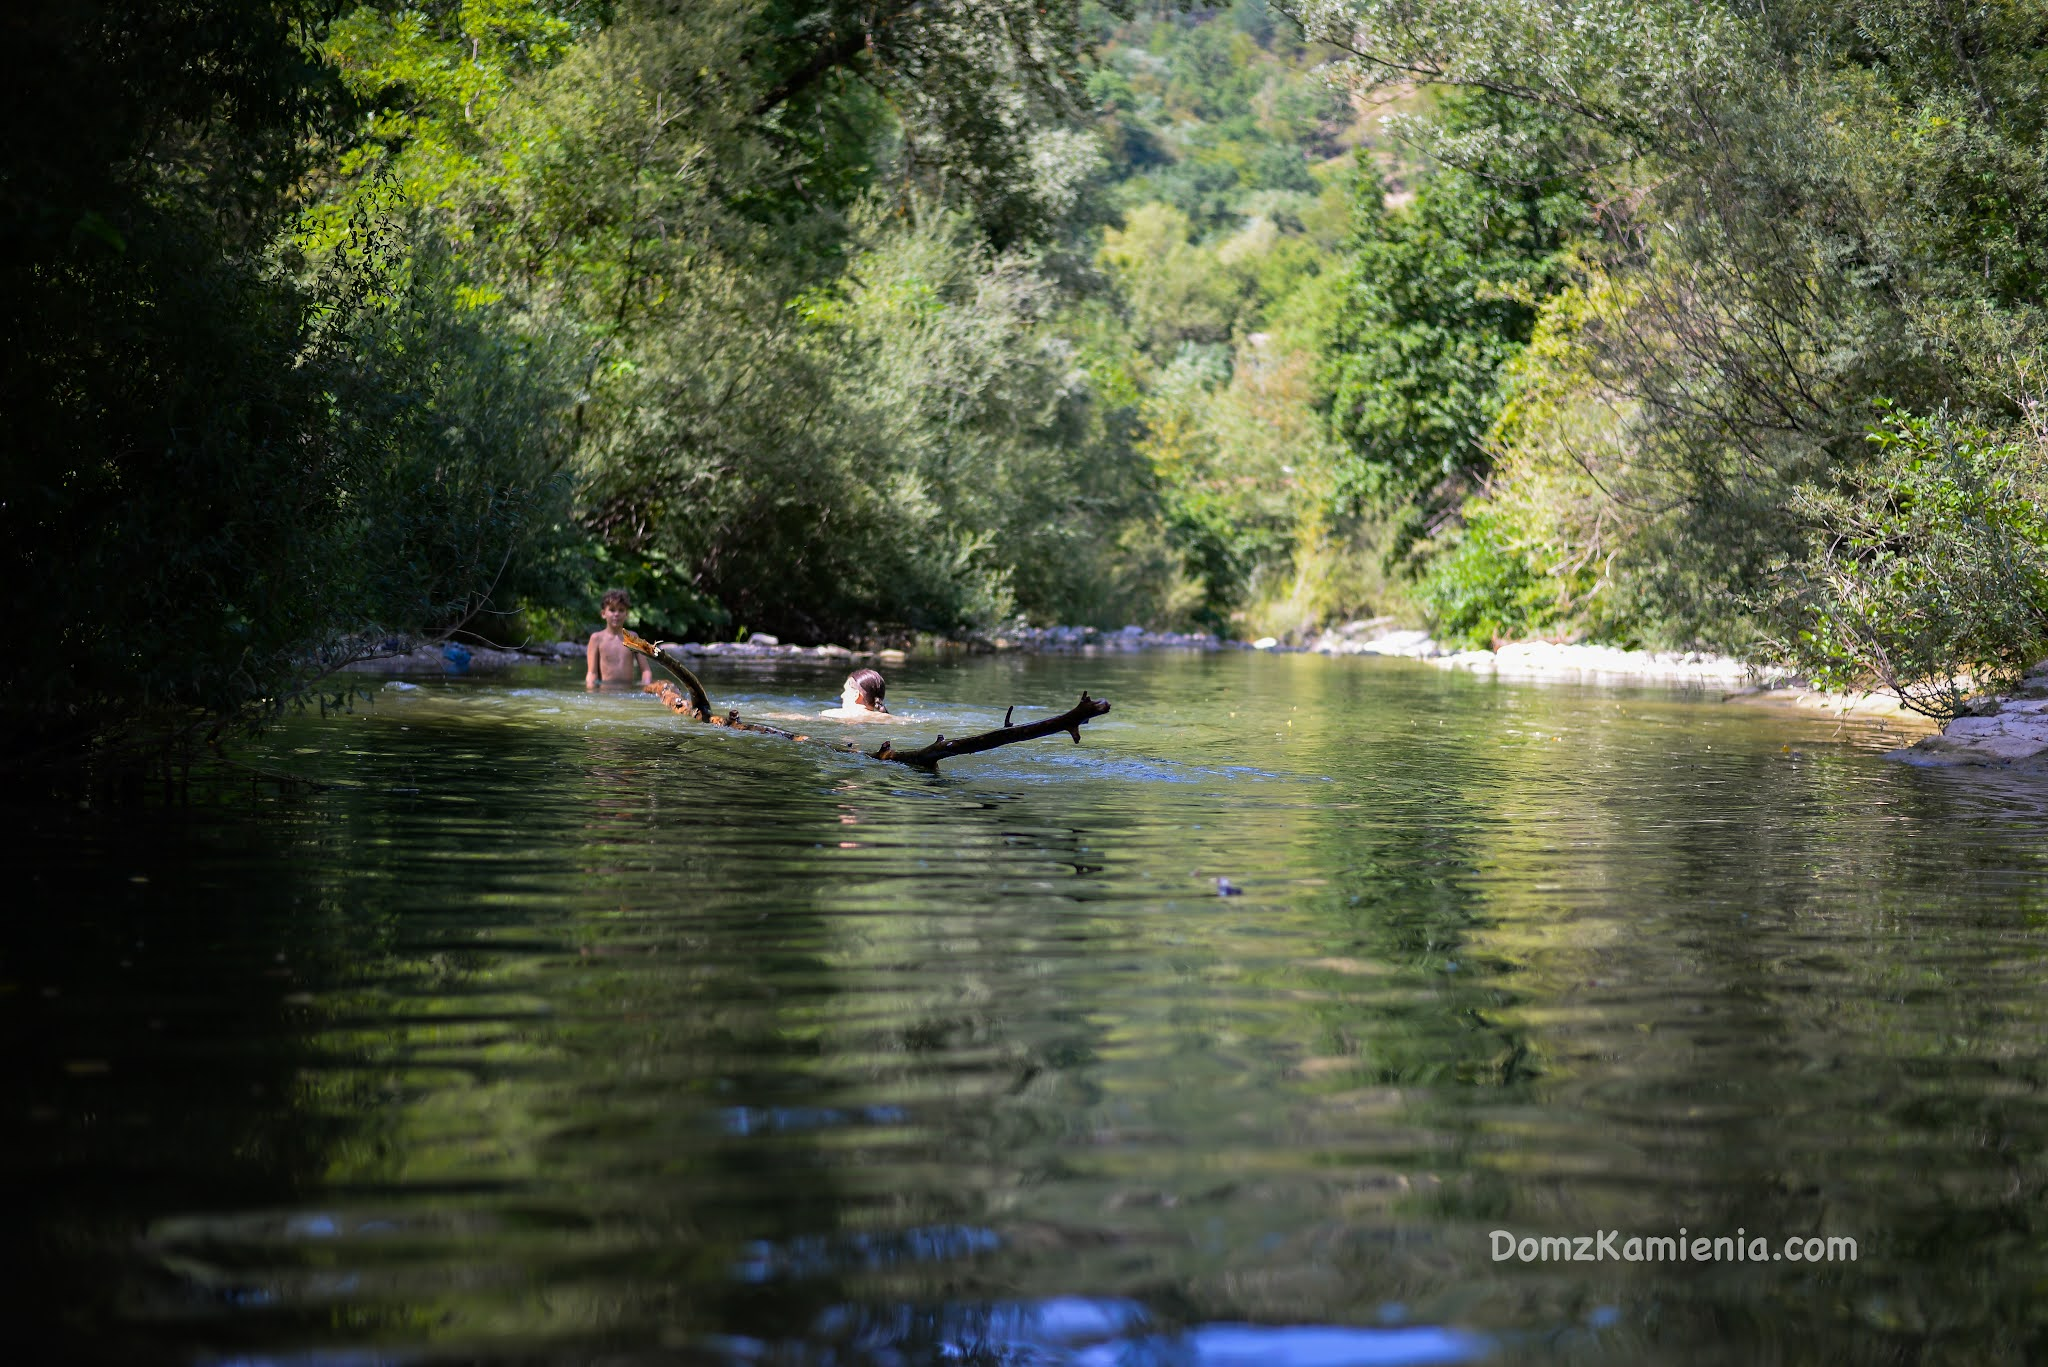 Dom z Kamienia blog - Ferragosto Marradi 2021